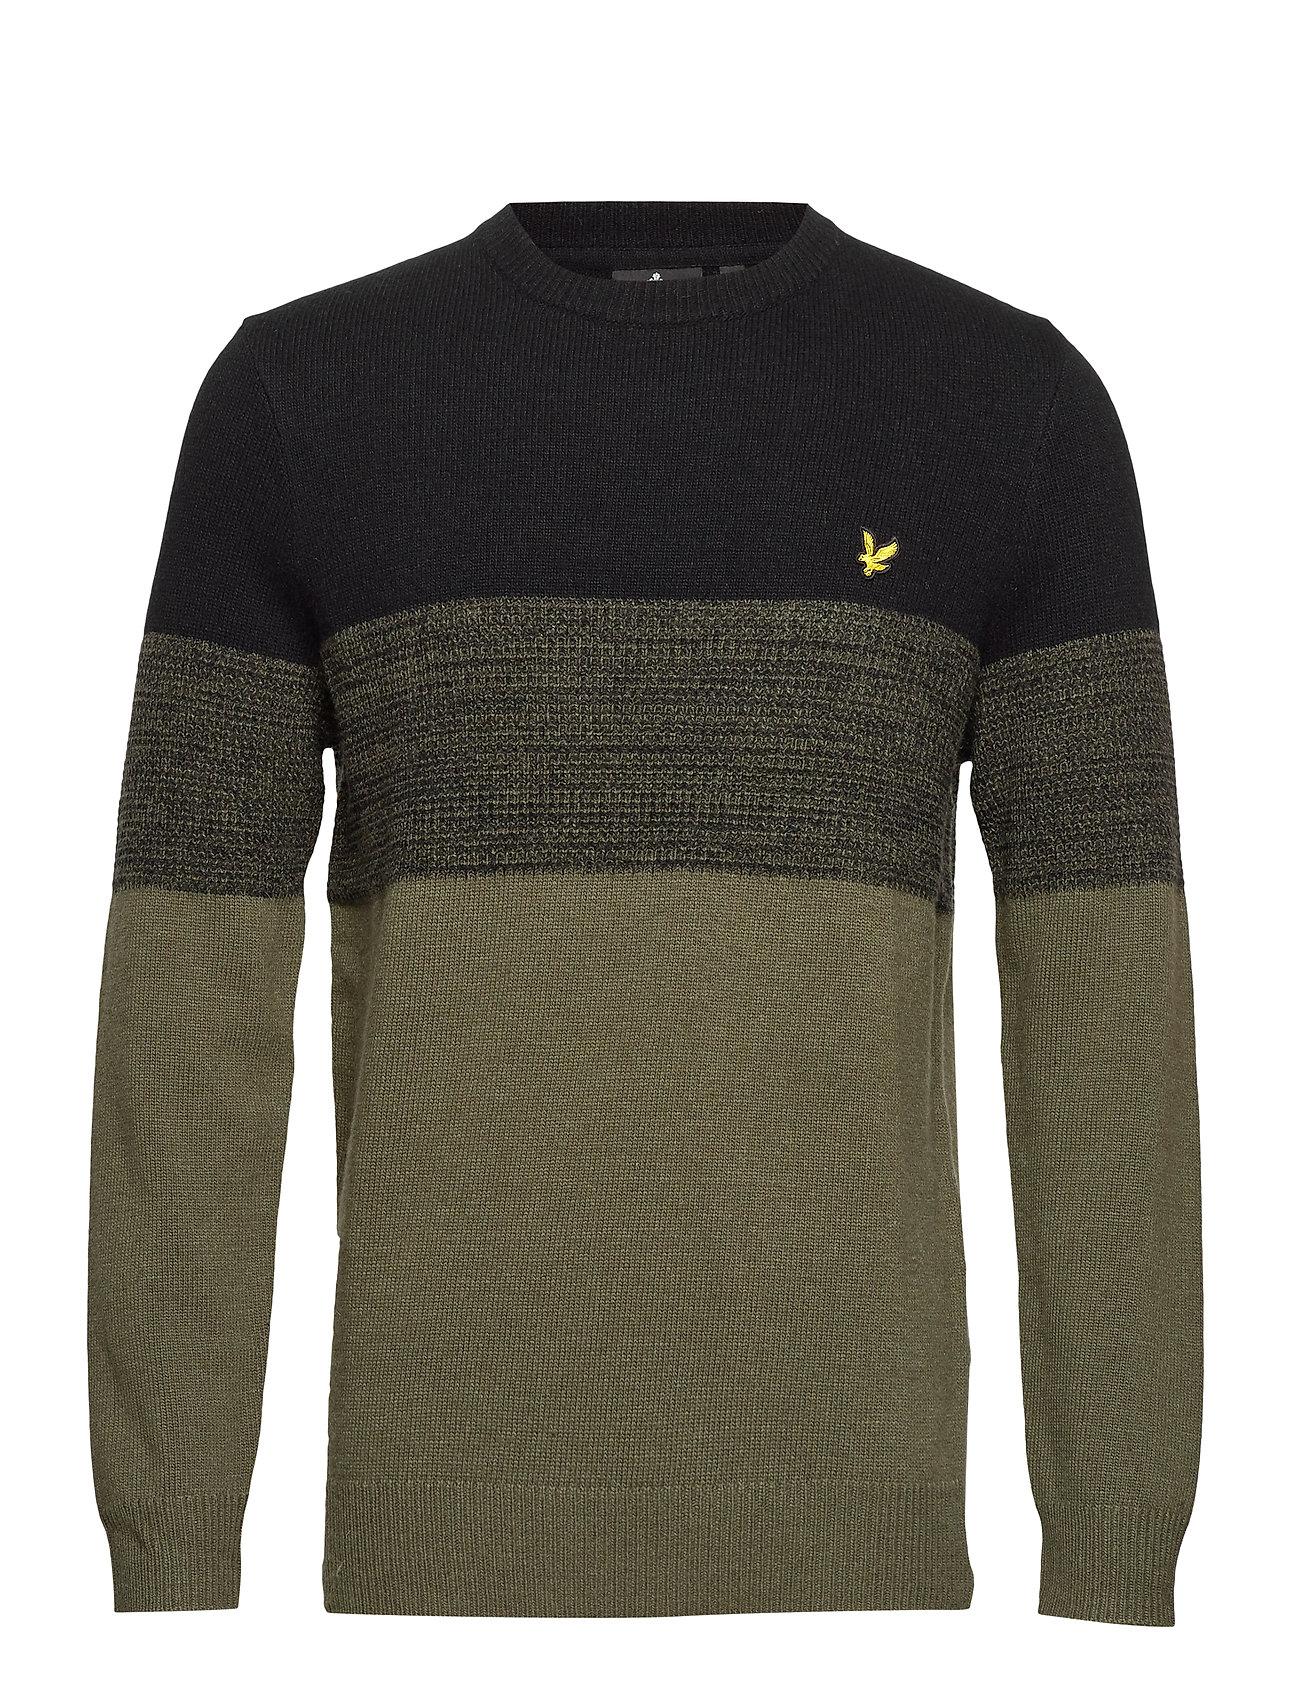 Lyle & Scott Chest Panel Knitted Jumper - TRUE BLACK/OLIVE